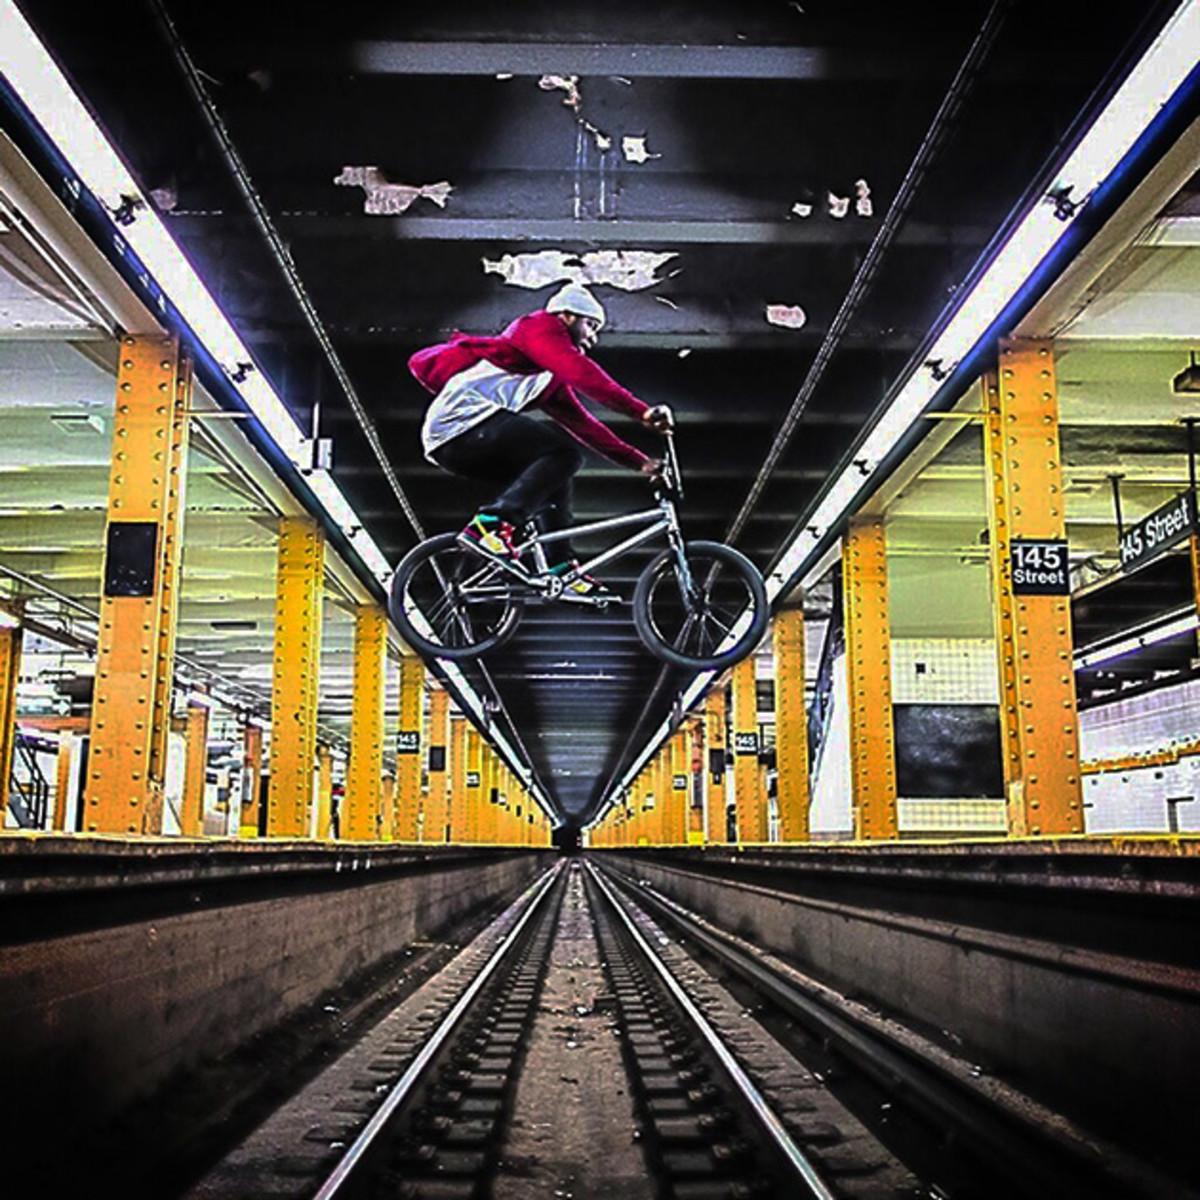 nigel-sylvester-subway-jump-630.jpg